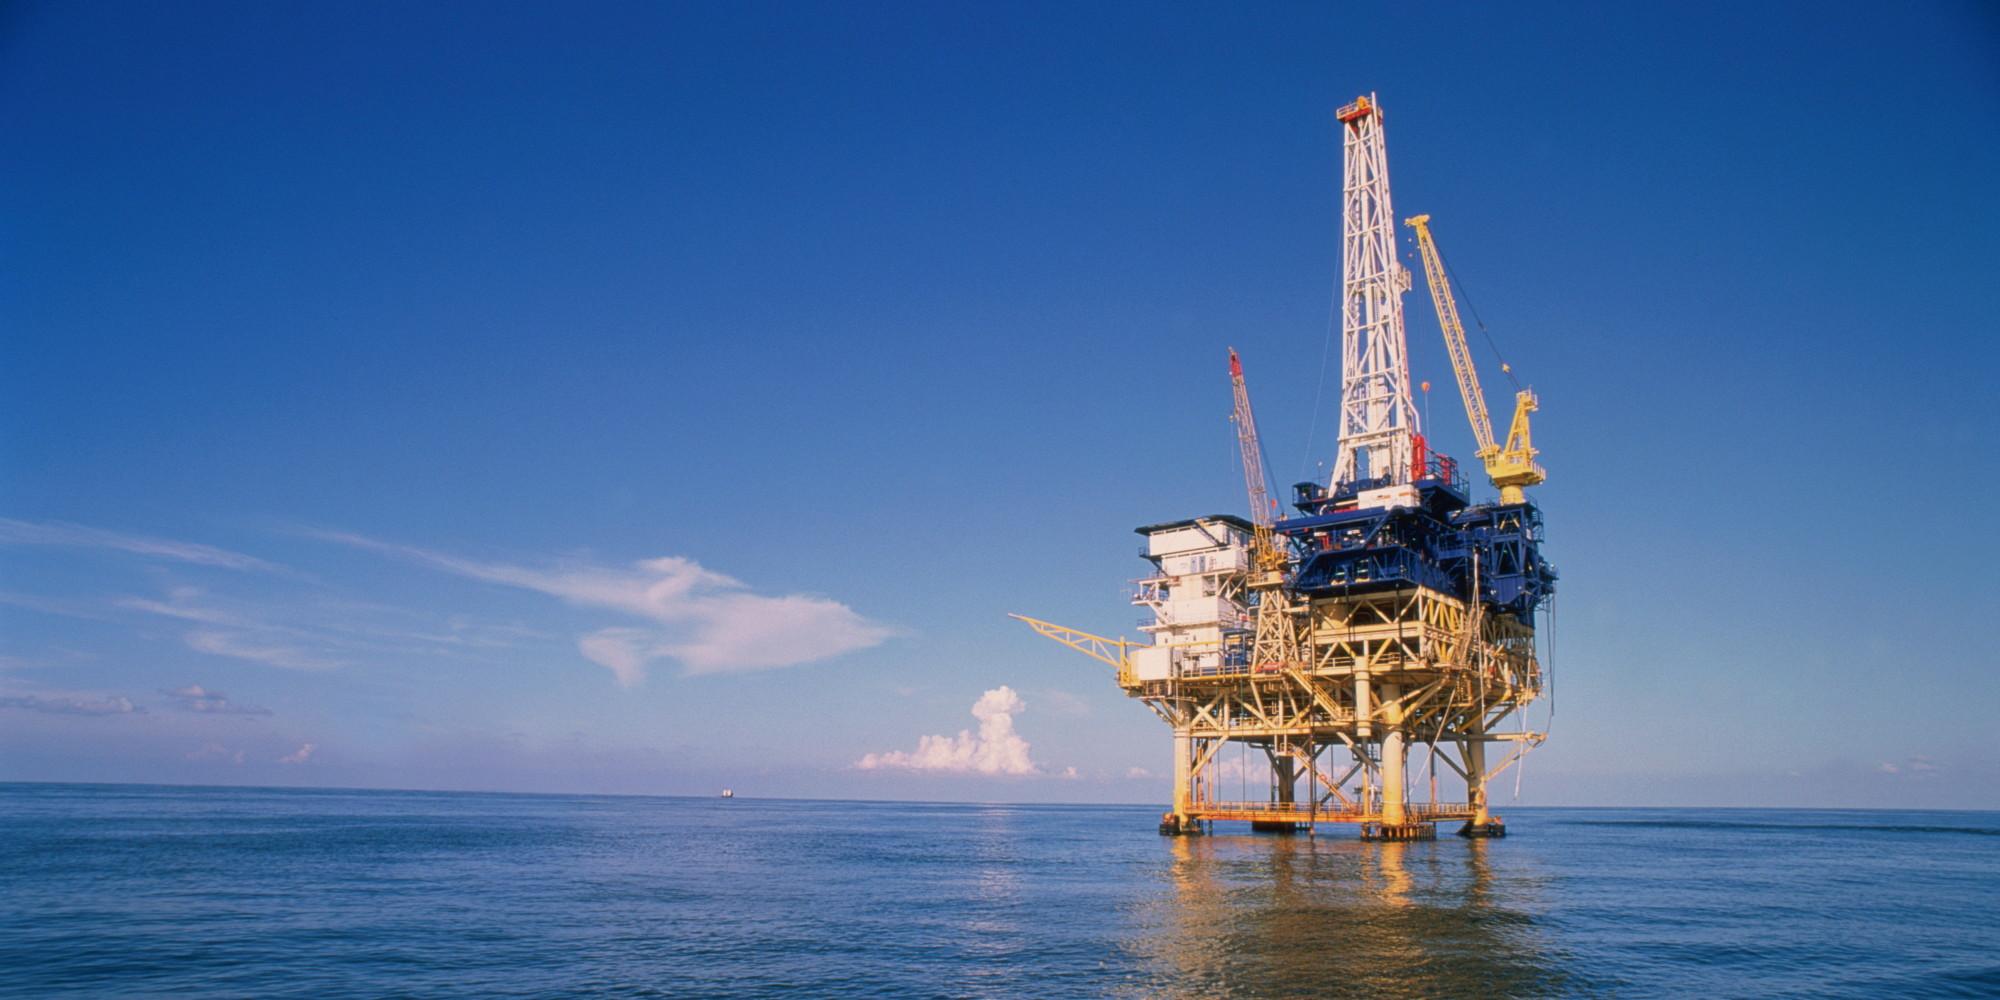 rig egypt oil gas